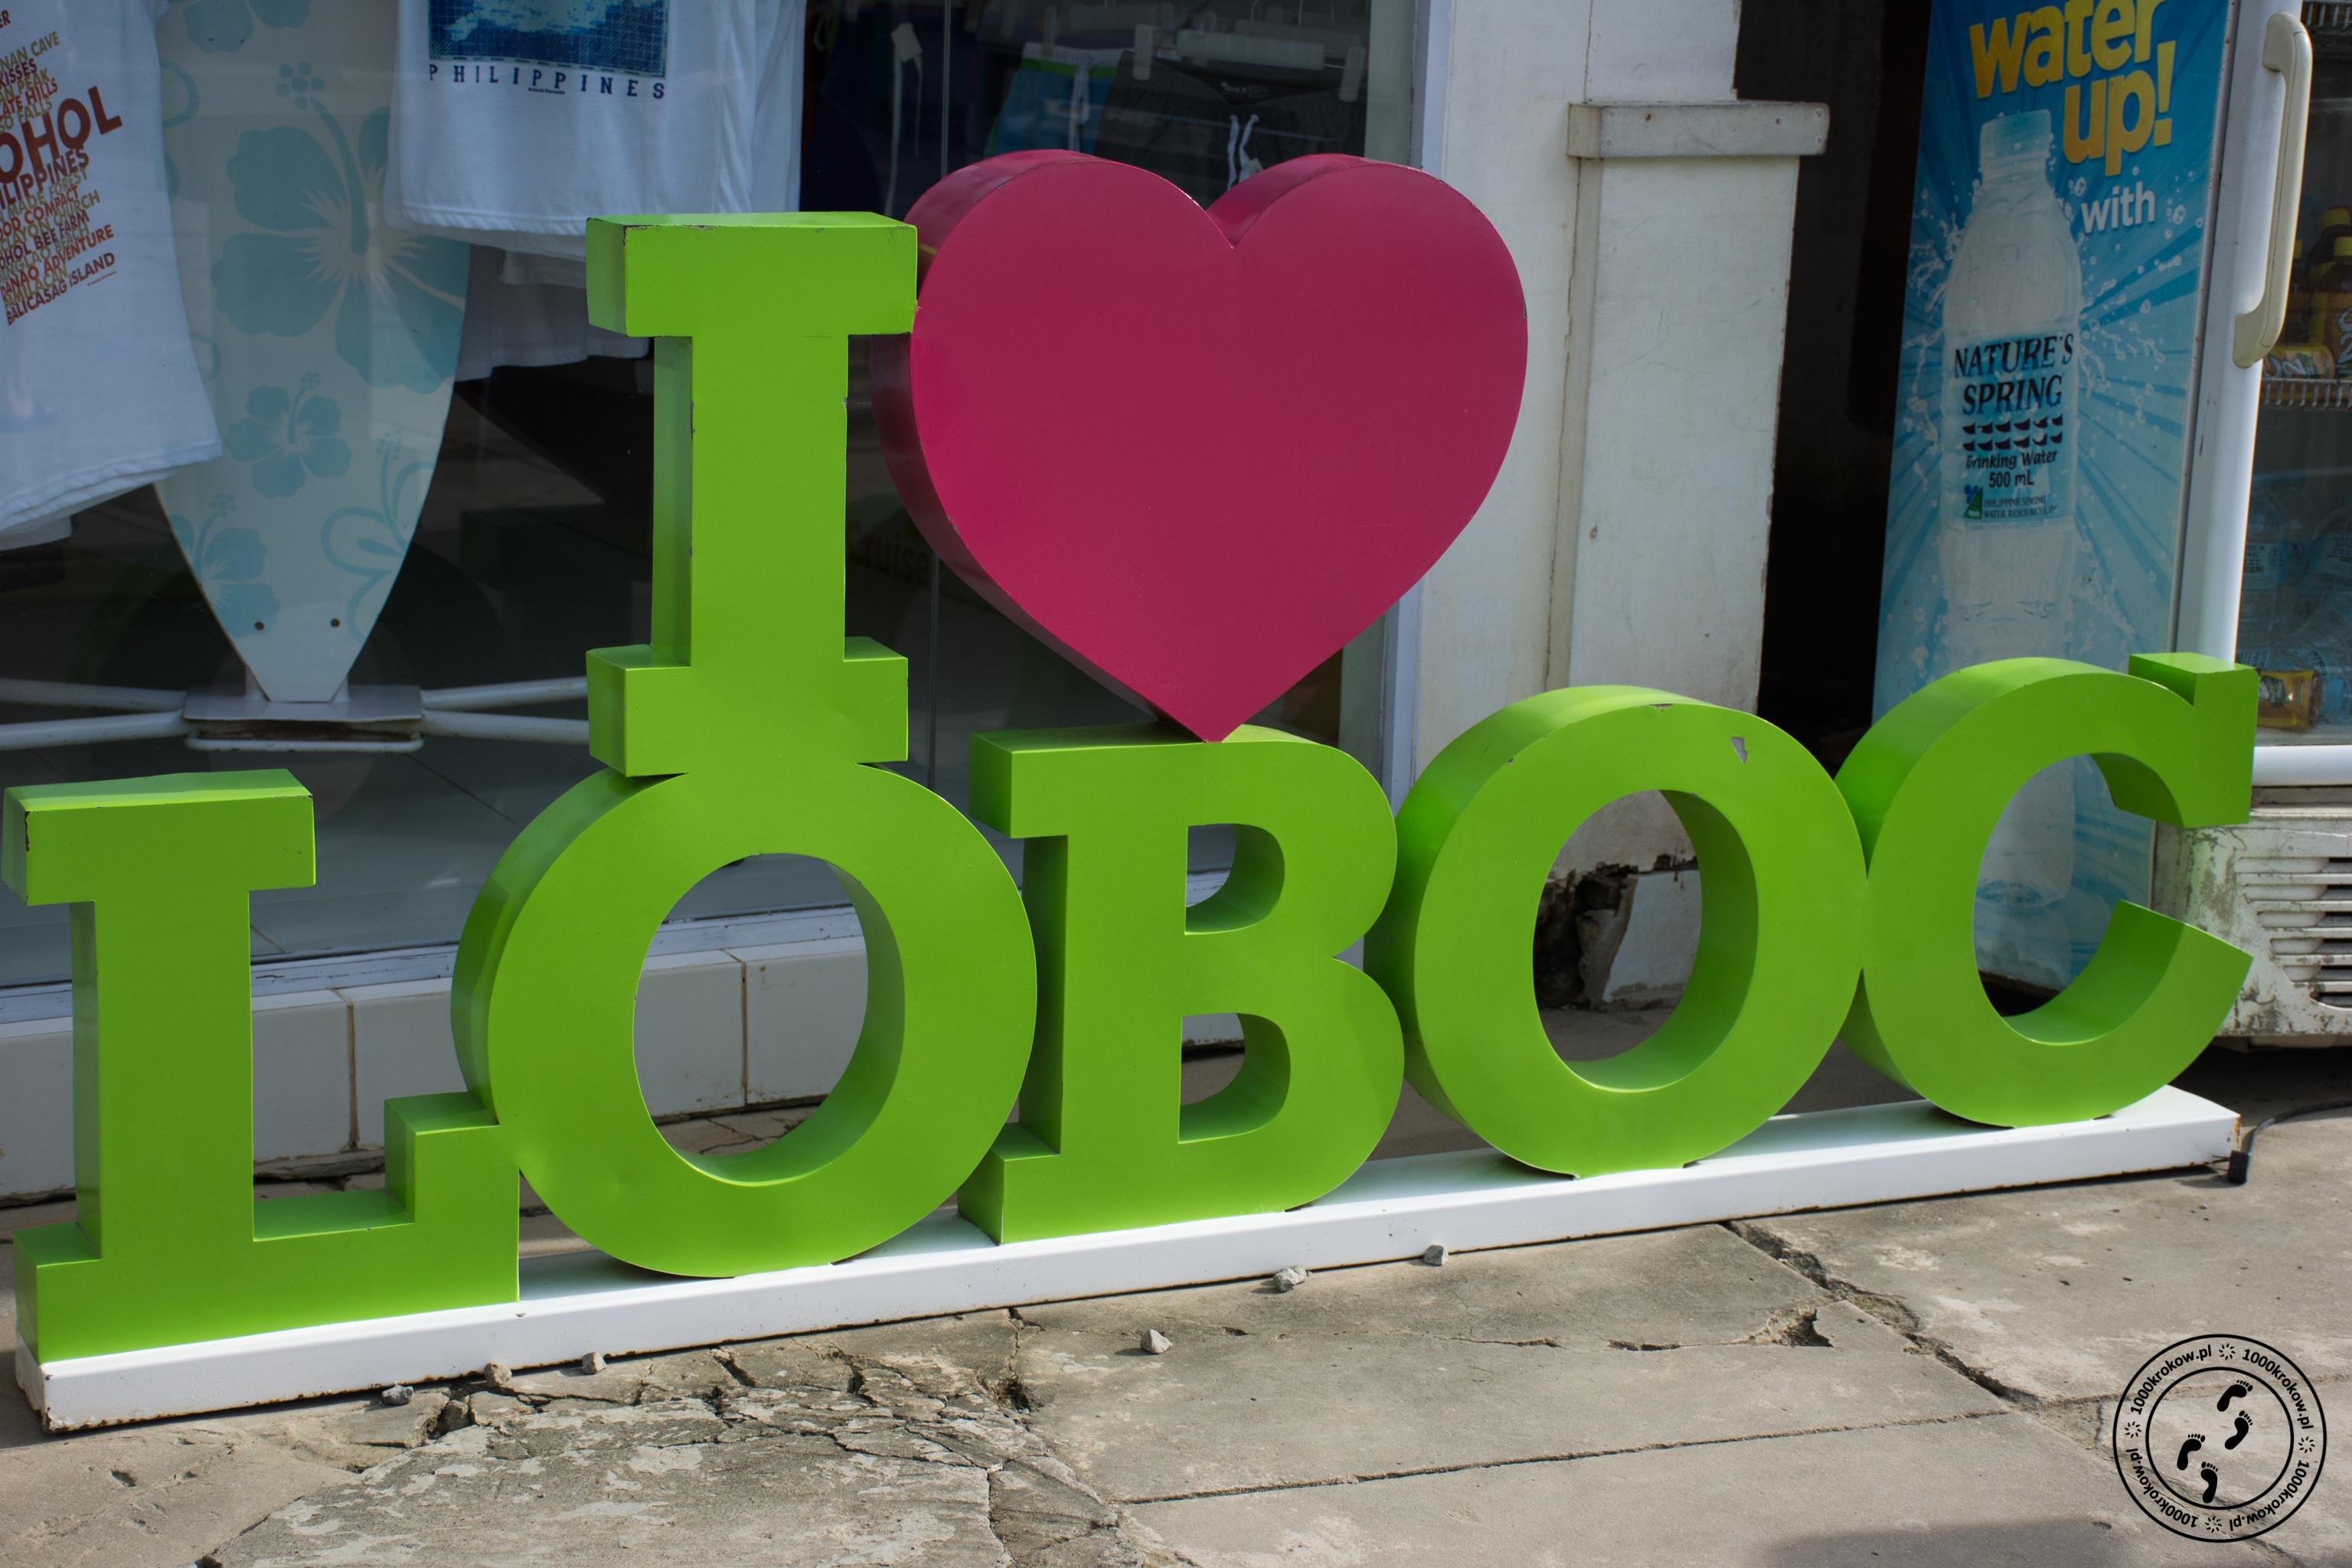 Loboc